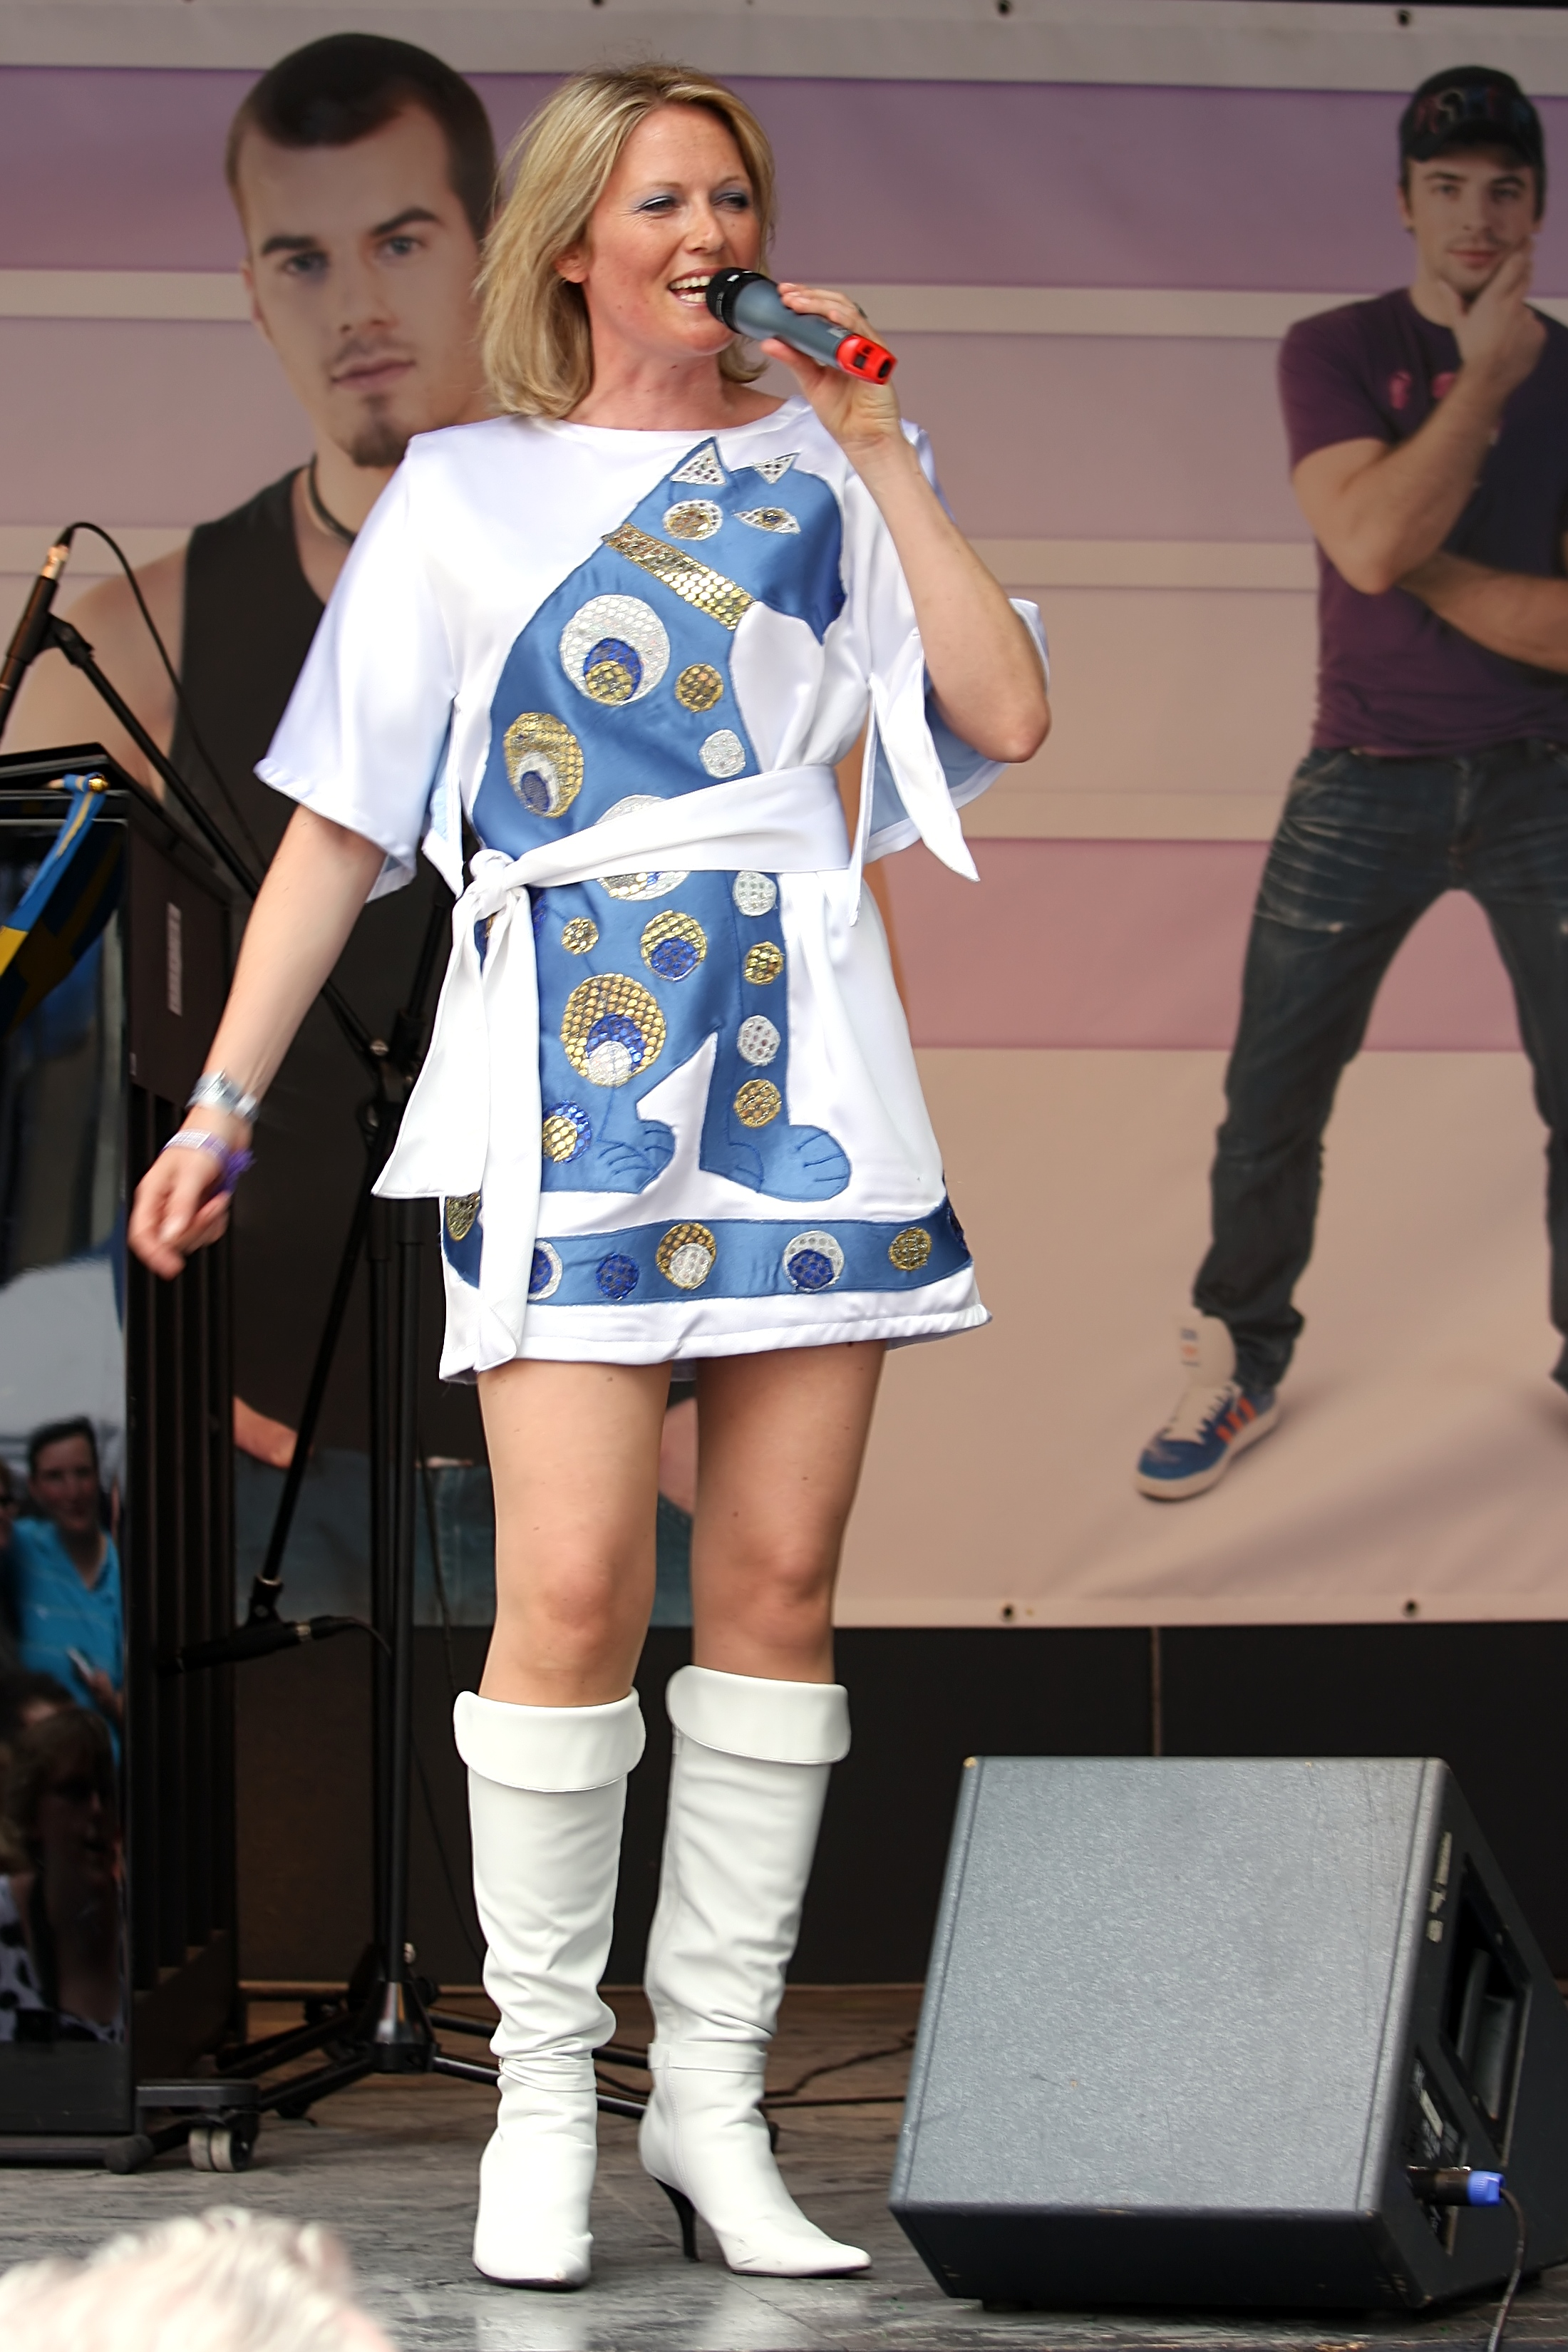 File:Meike Gottschalk als Agnetha - ColognePride 2009 (2384).jpg